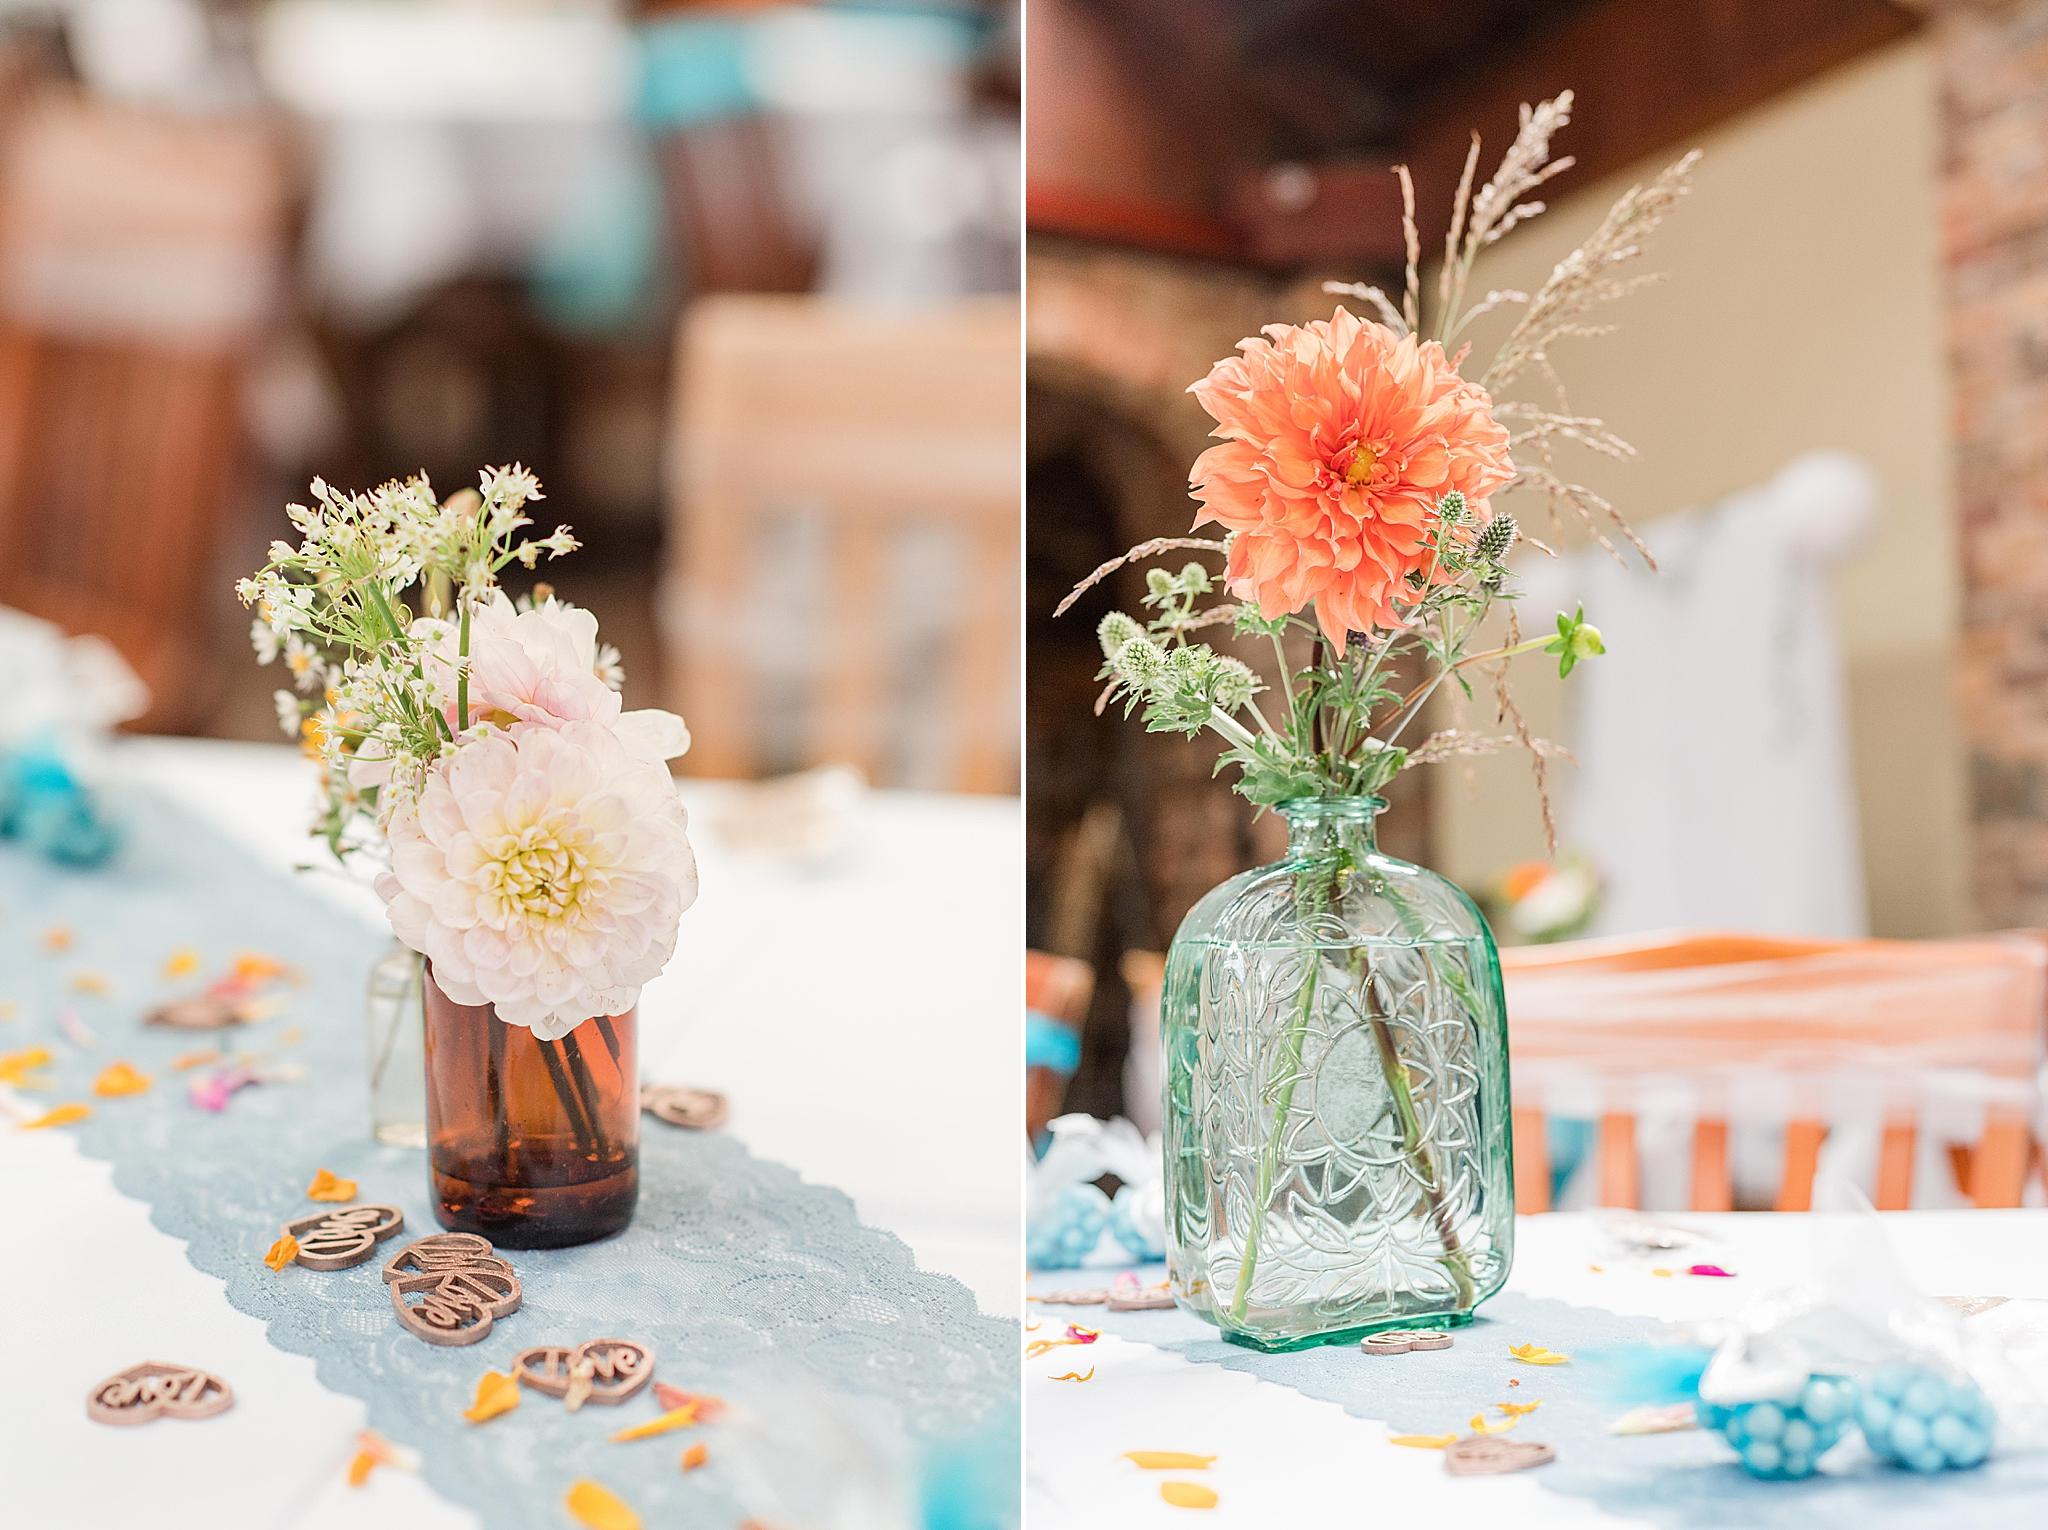 Seville Quarter wedding reception centerpieces with flowers